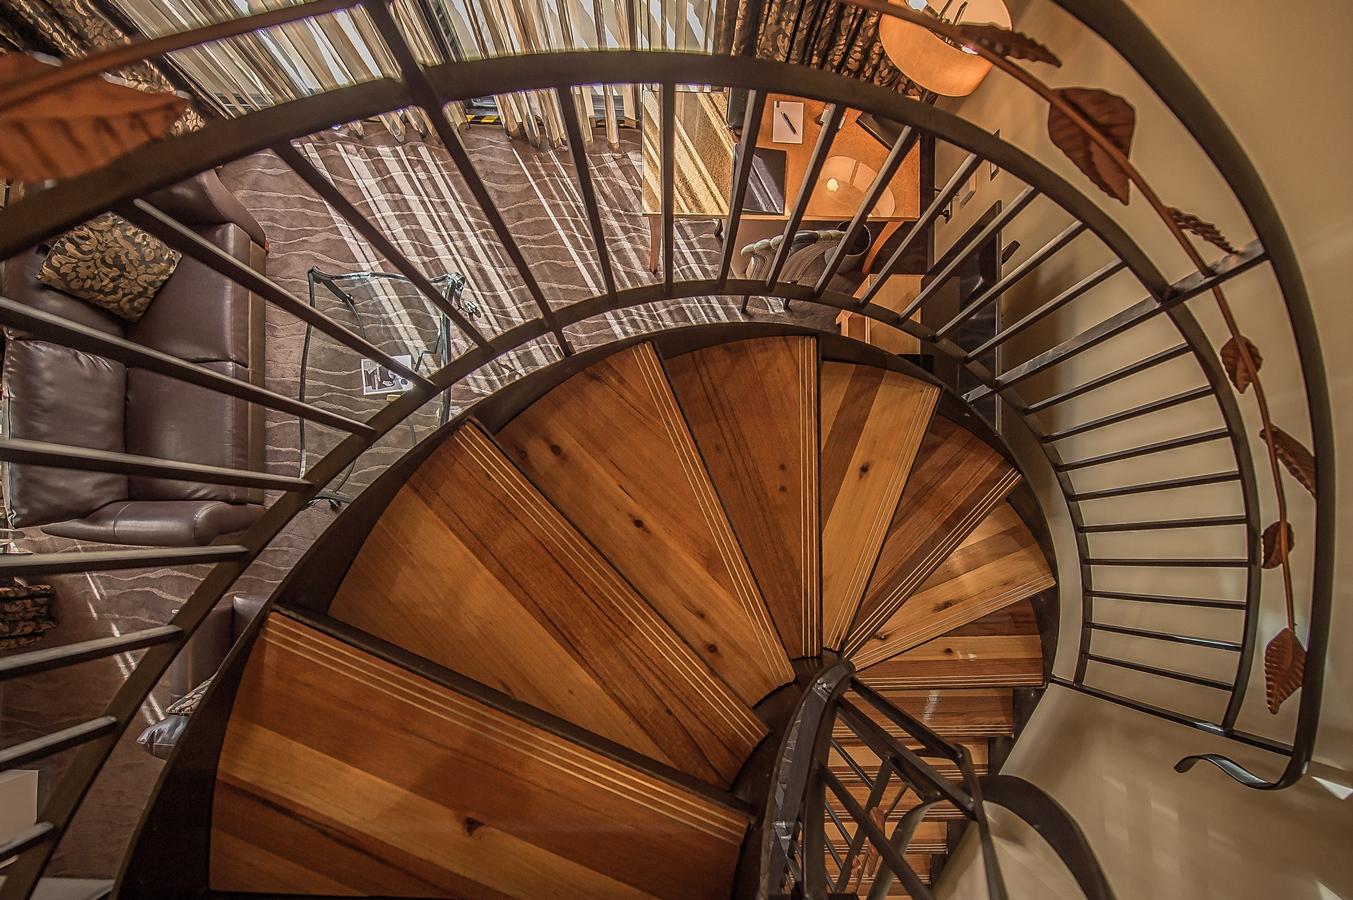 Top view of a brown color iron circular staircase